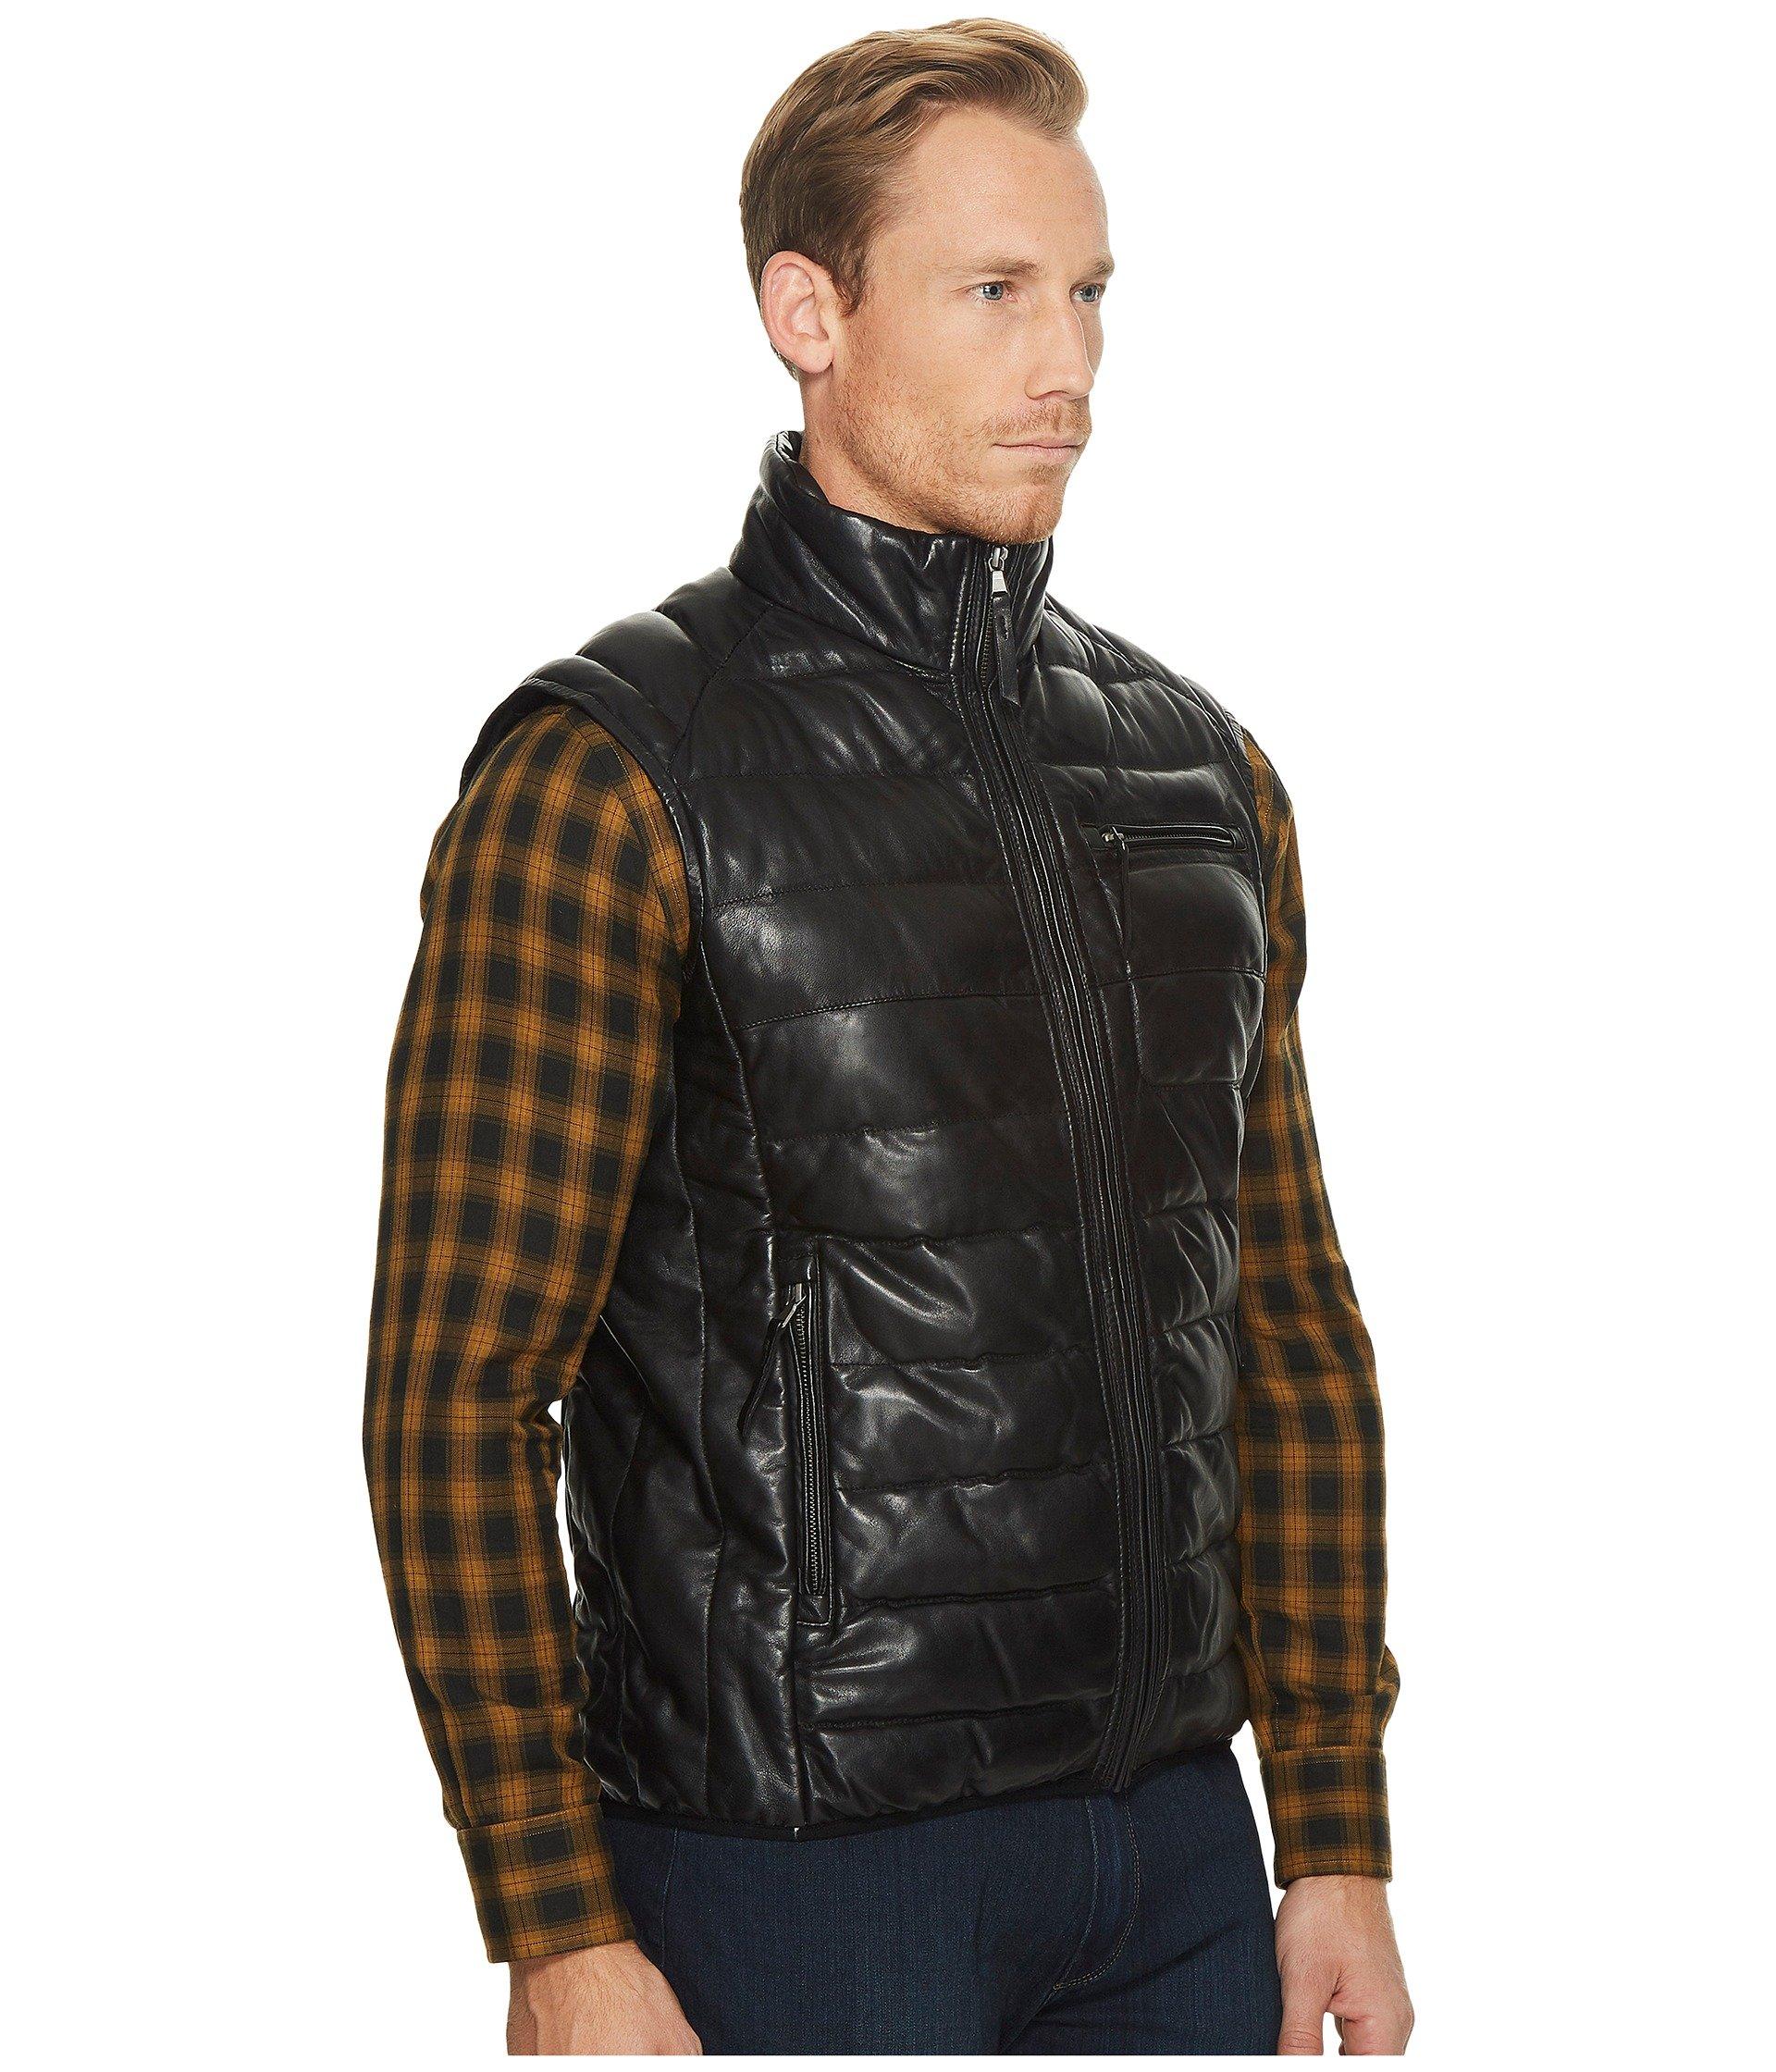 Leather Ribbed Scully Butta Soft Noah Vest Black Like wqXwUSAI